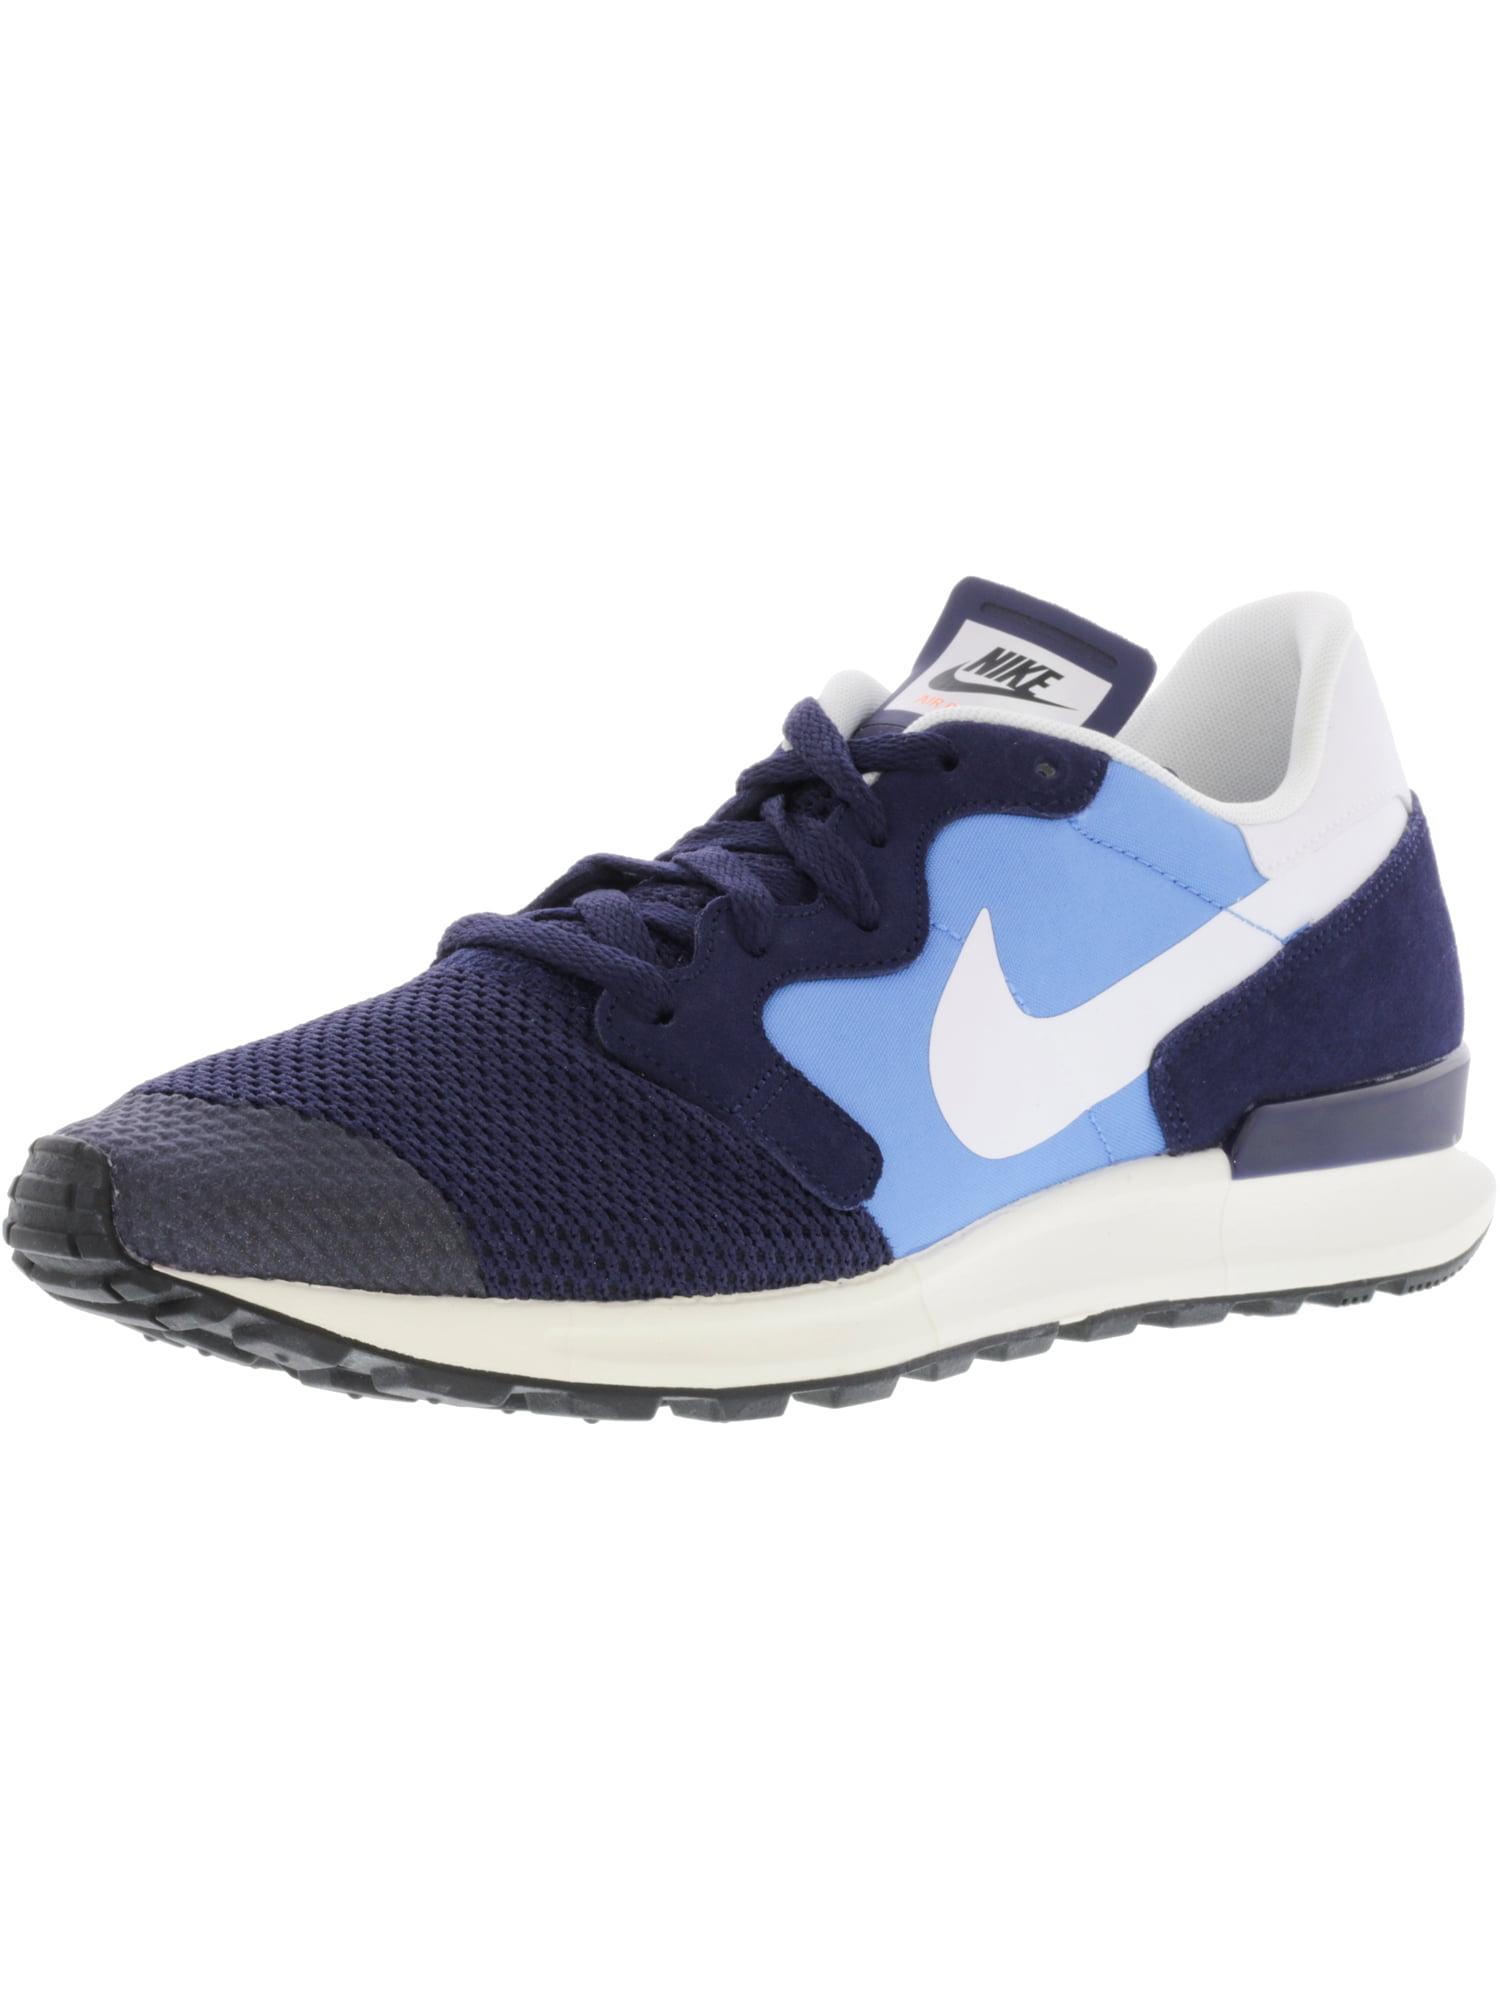 promo code 15992 05861 where to buy nike mens air berwuda blitz blue white blackened ankle high  running shoe 10m